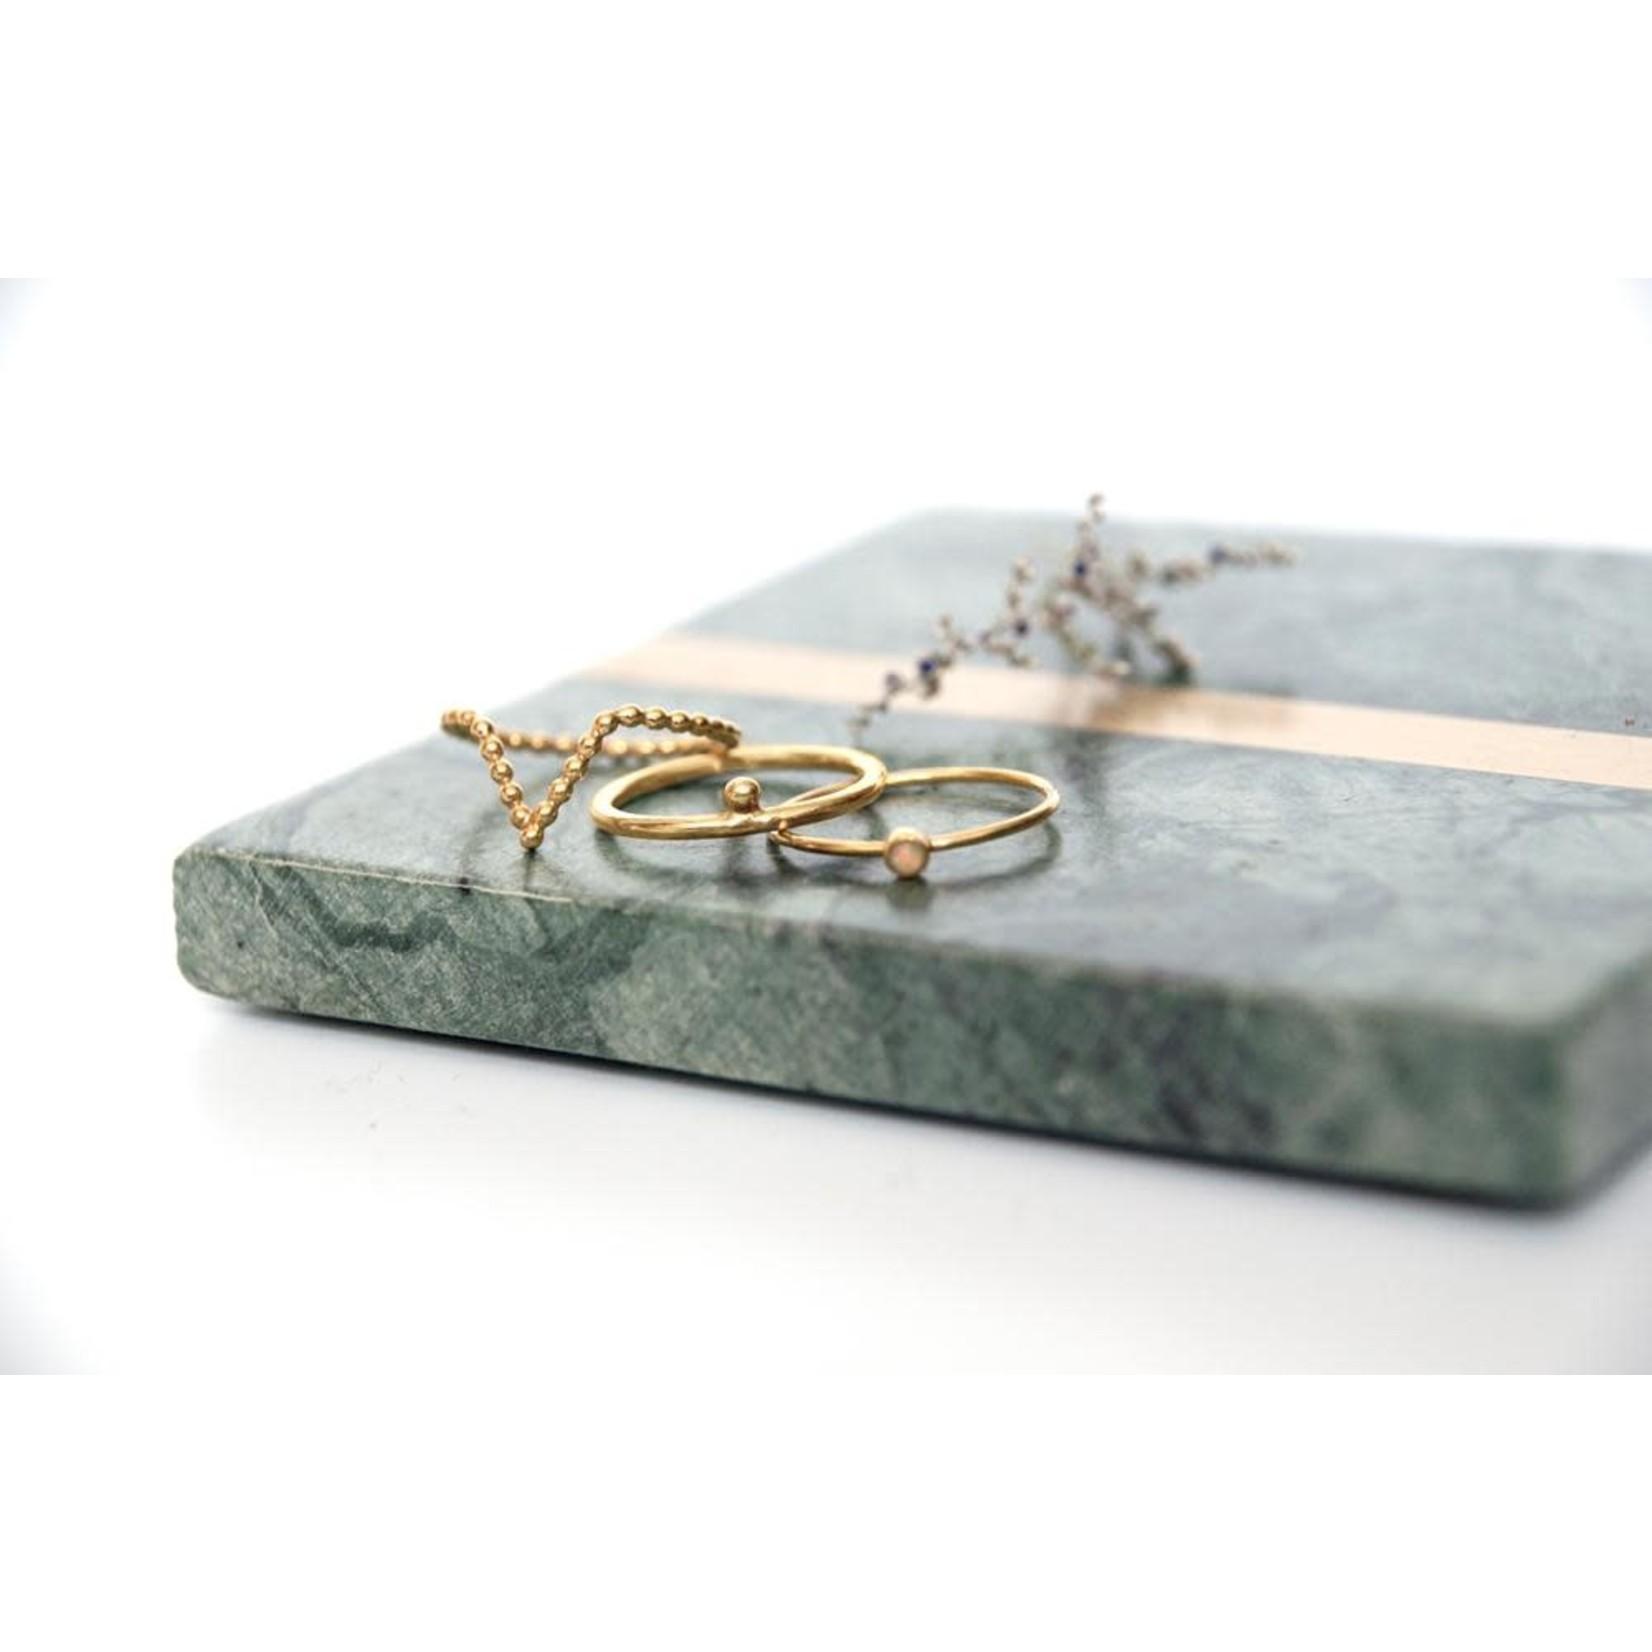 Welldunn jewelry Welldunn bague DAINTY or